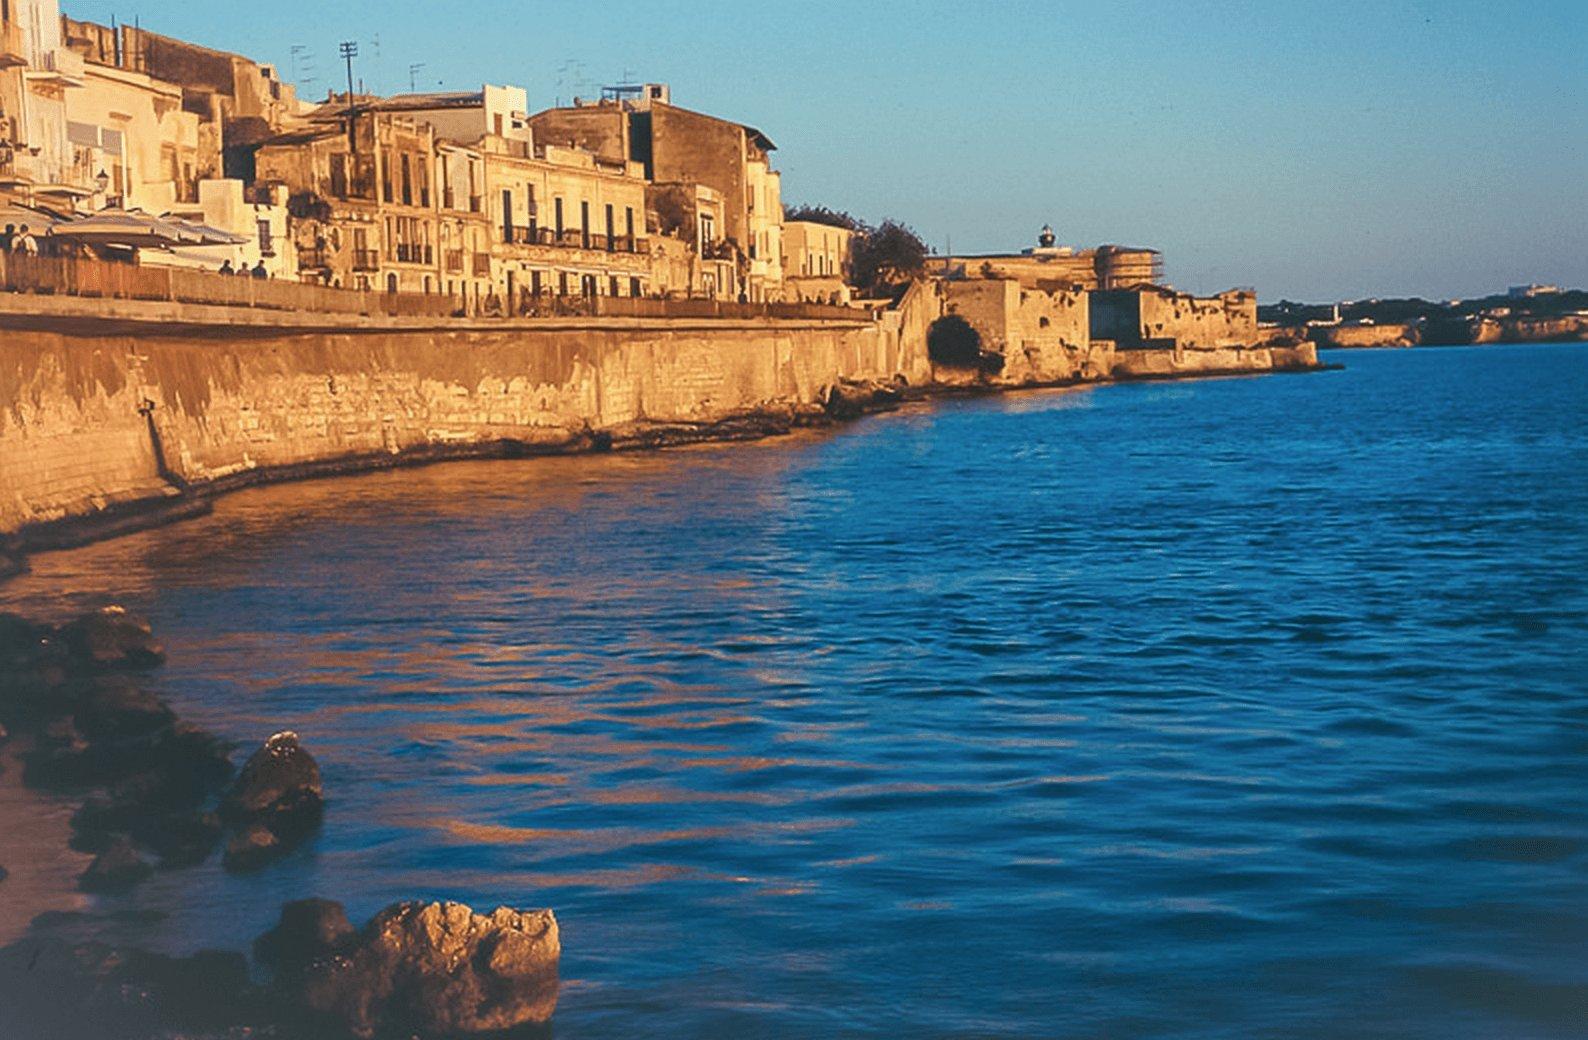 catania-yacht-charter-catania-boat-rental-catania-boat-hire-catania-boat-trip-catania-sailing-charter-siracusa-itinerary